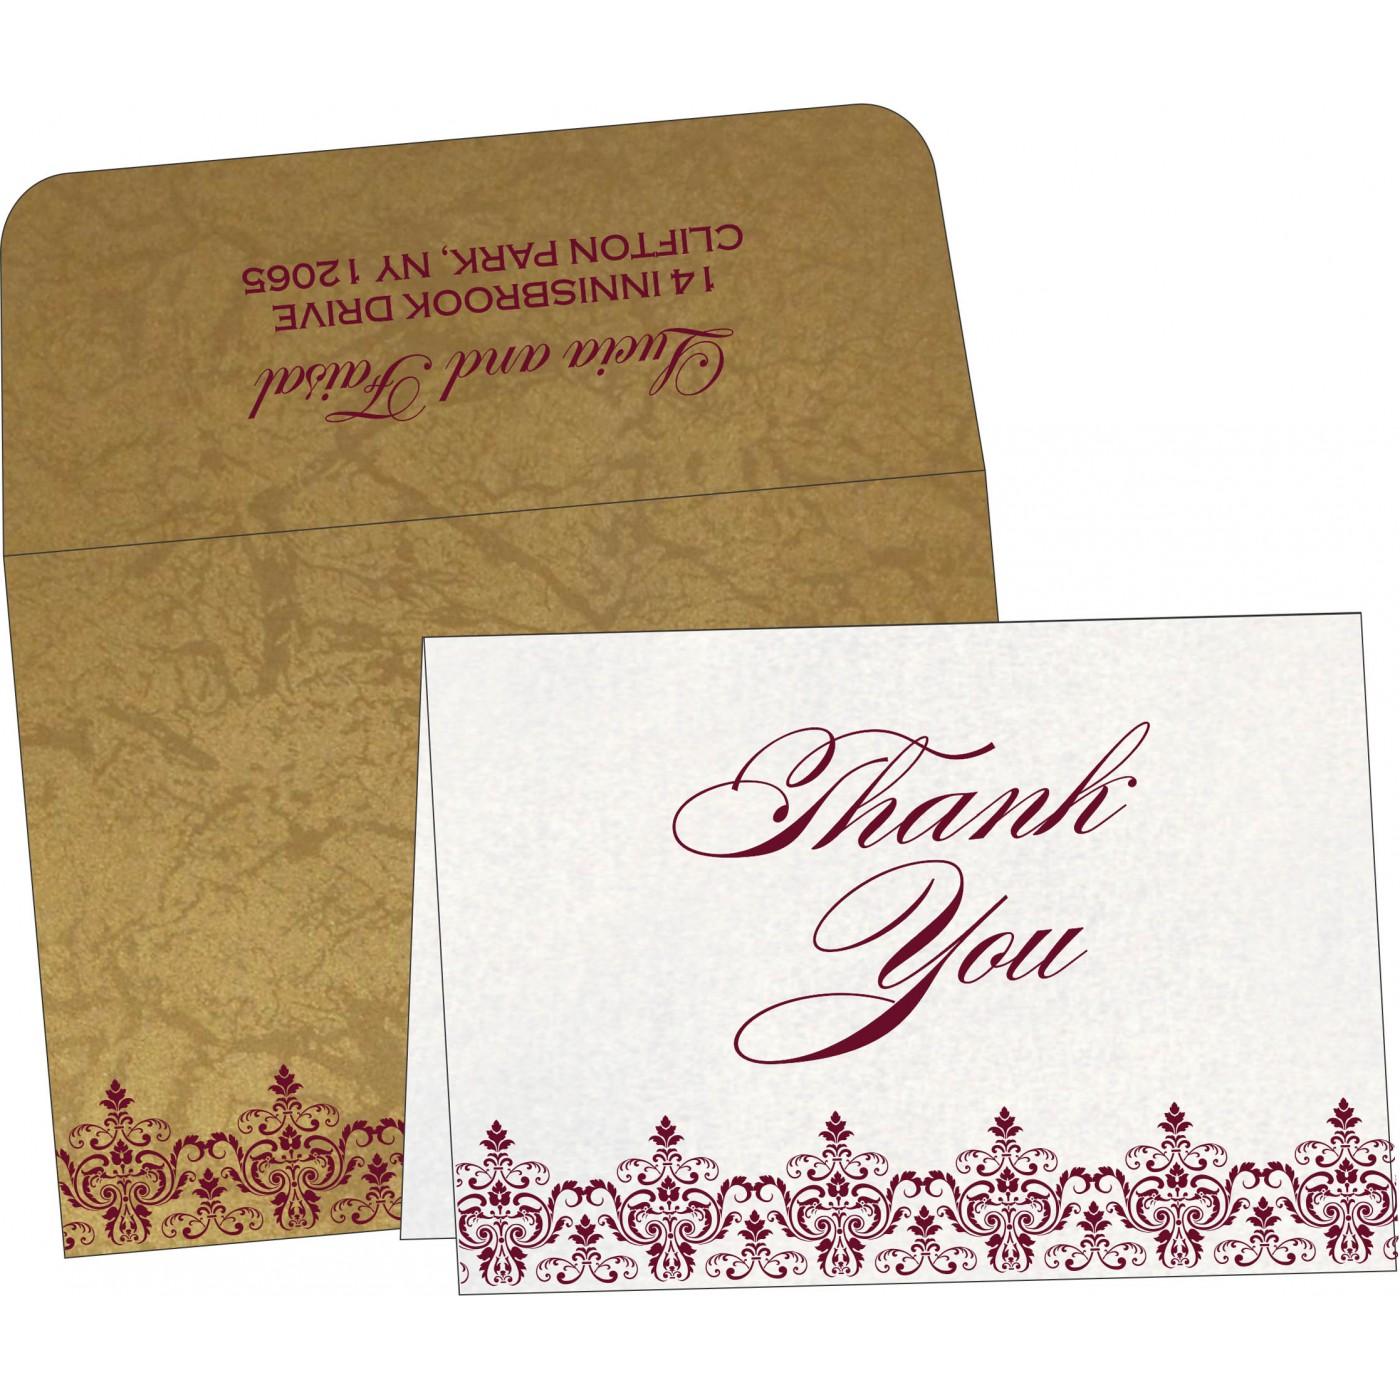 Thank You Cards : TYC-8244G - 123WeddingCards